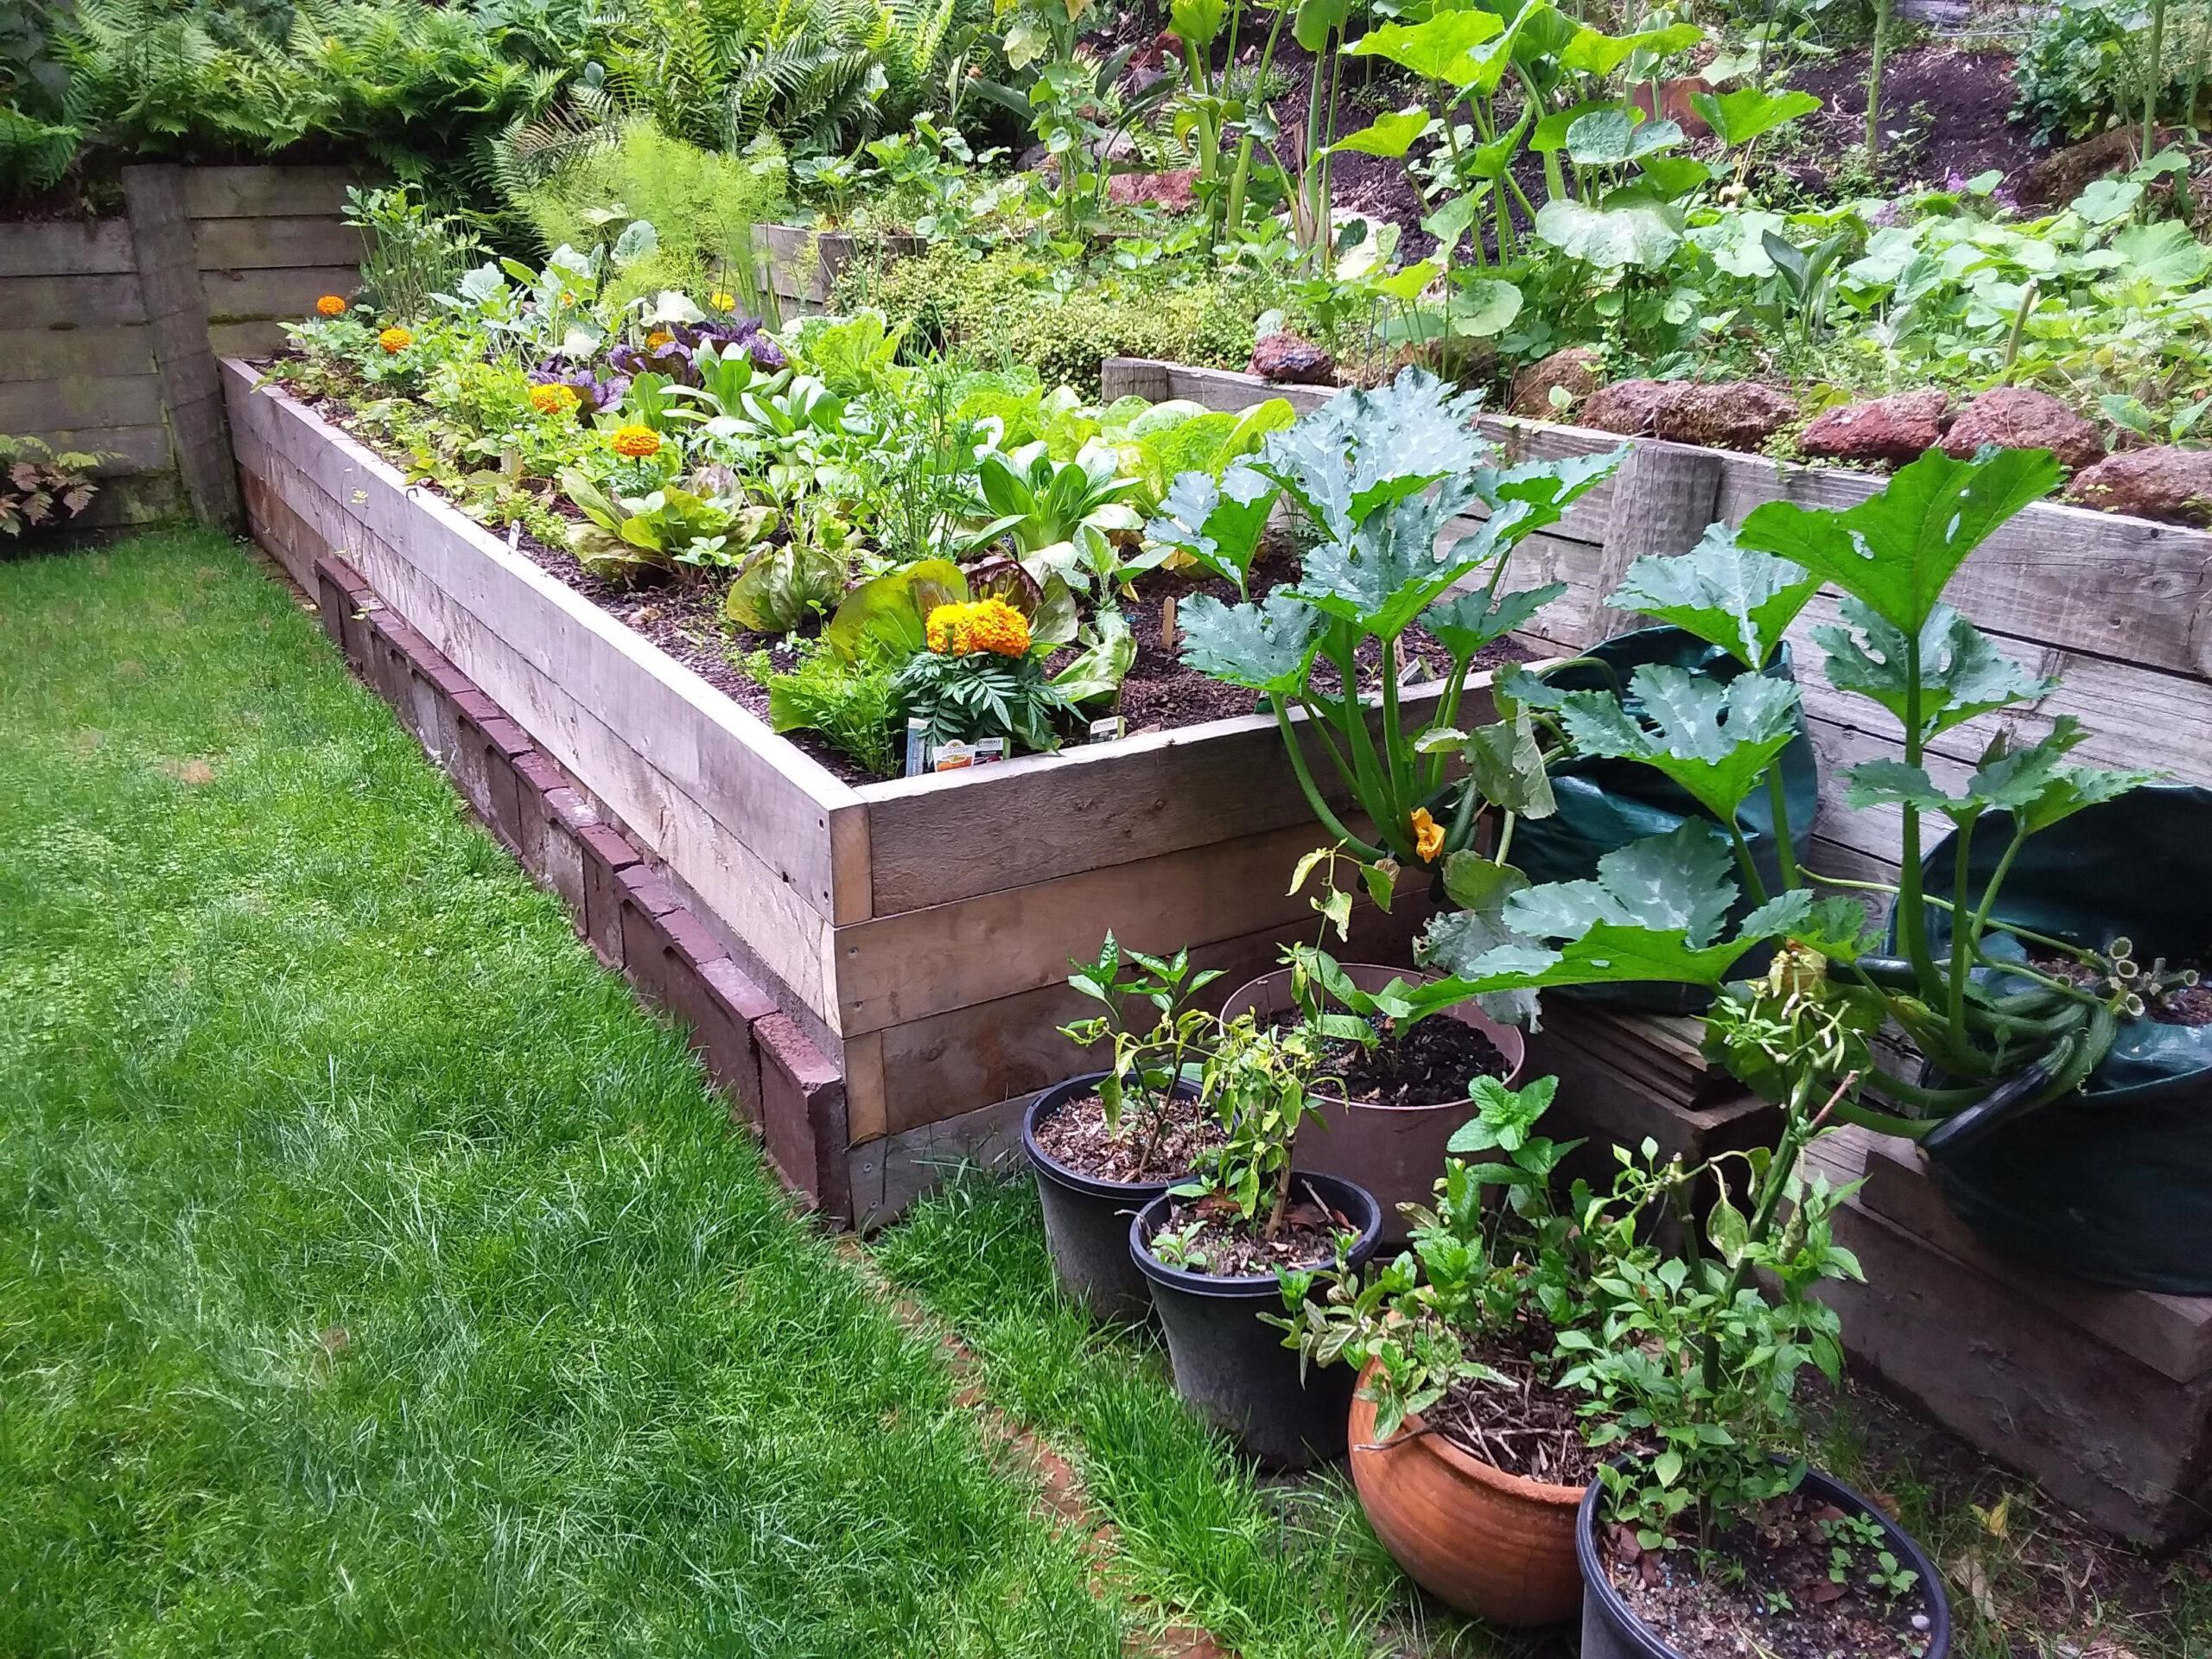 Macrocarpa planter terrace in garden